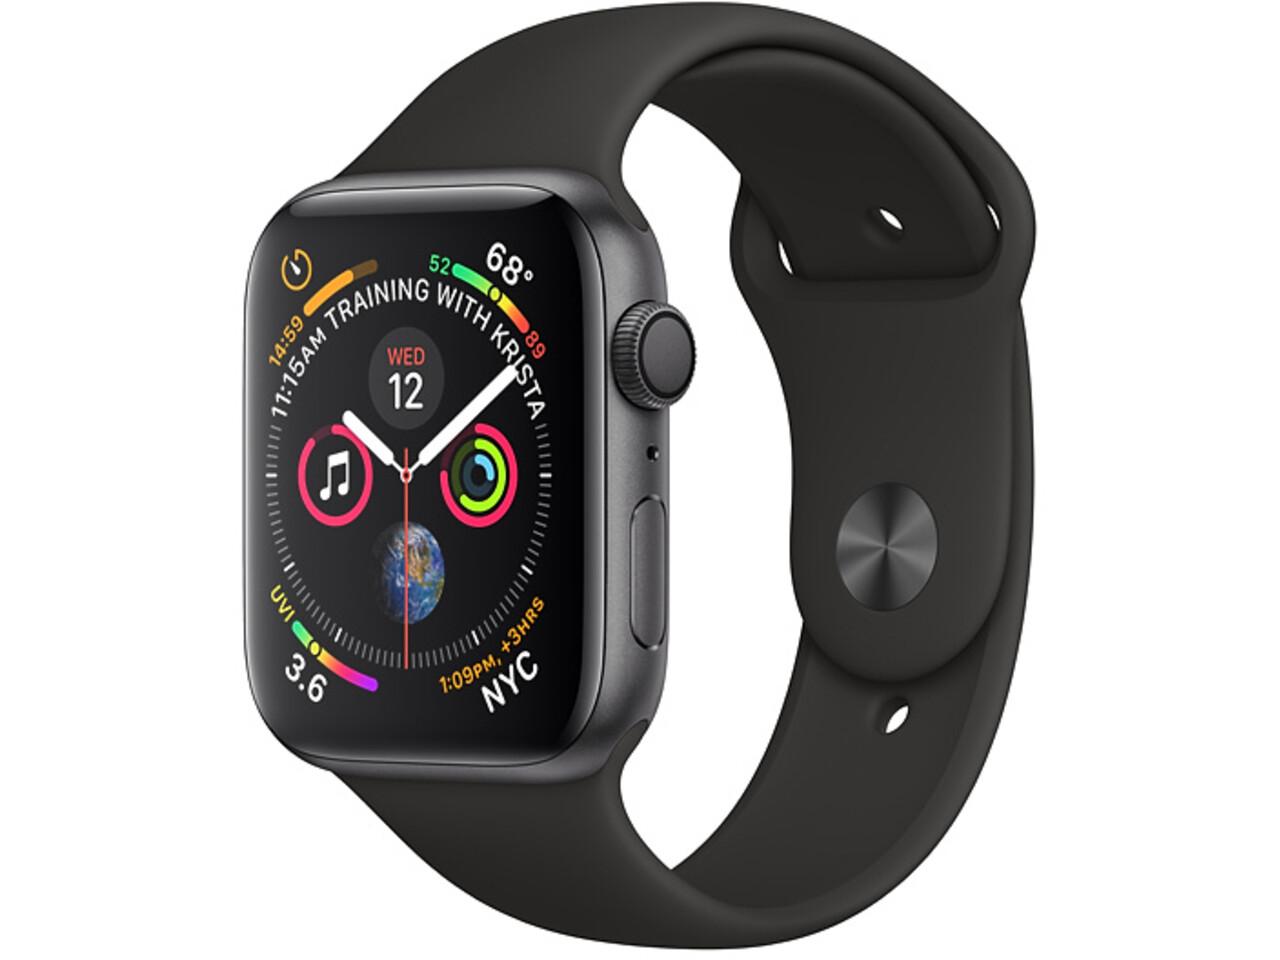 apple watch series 4 40mm space gray aluminum black sport band